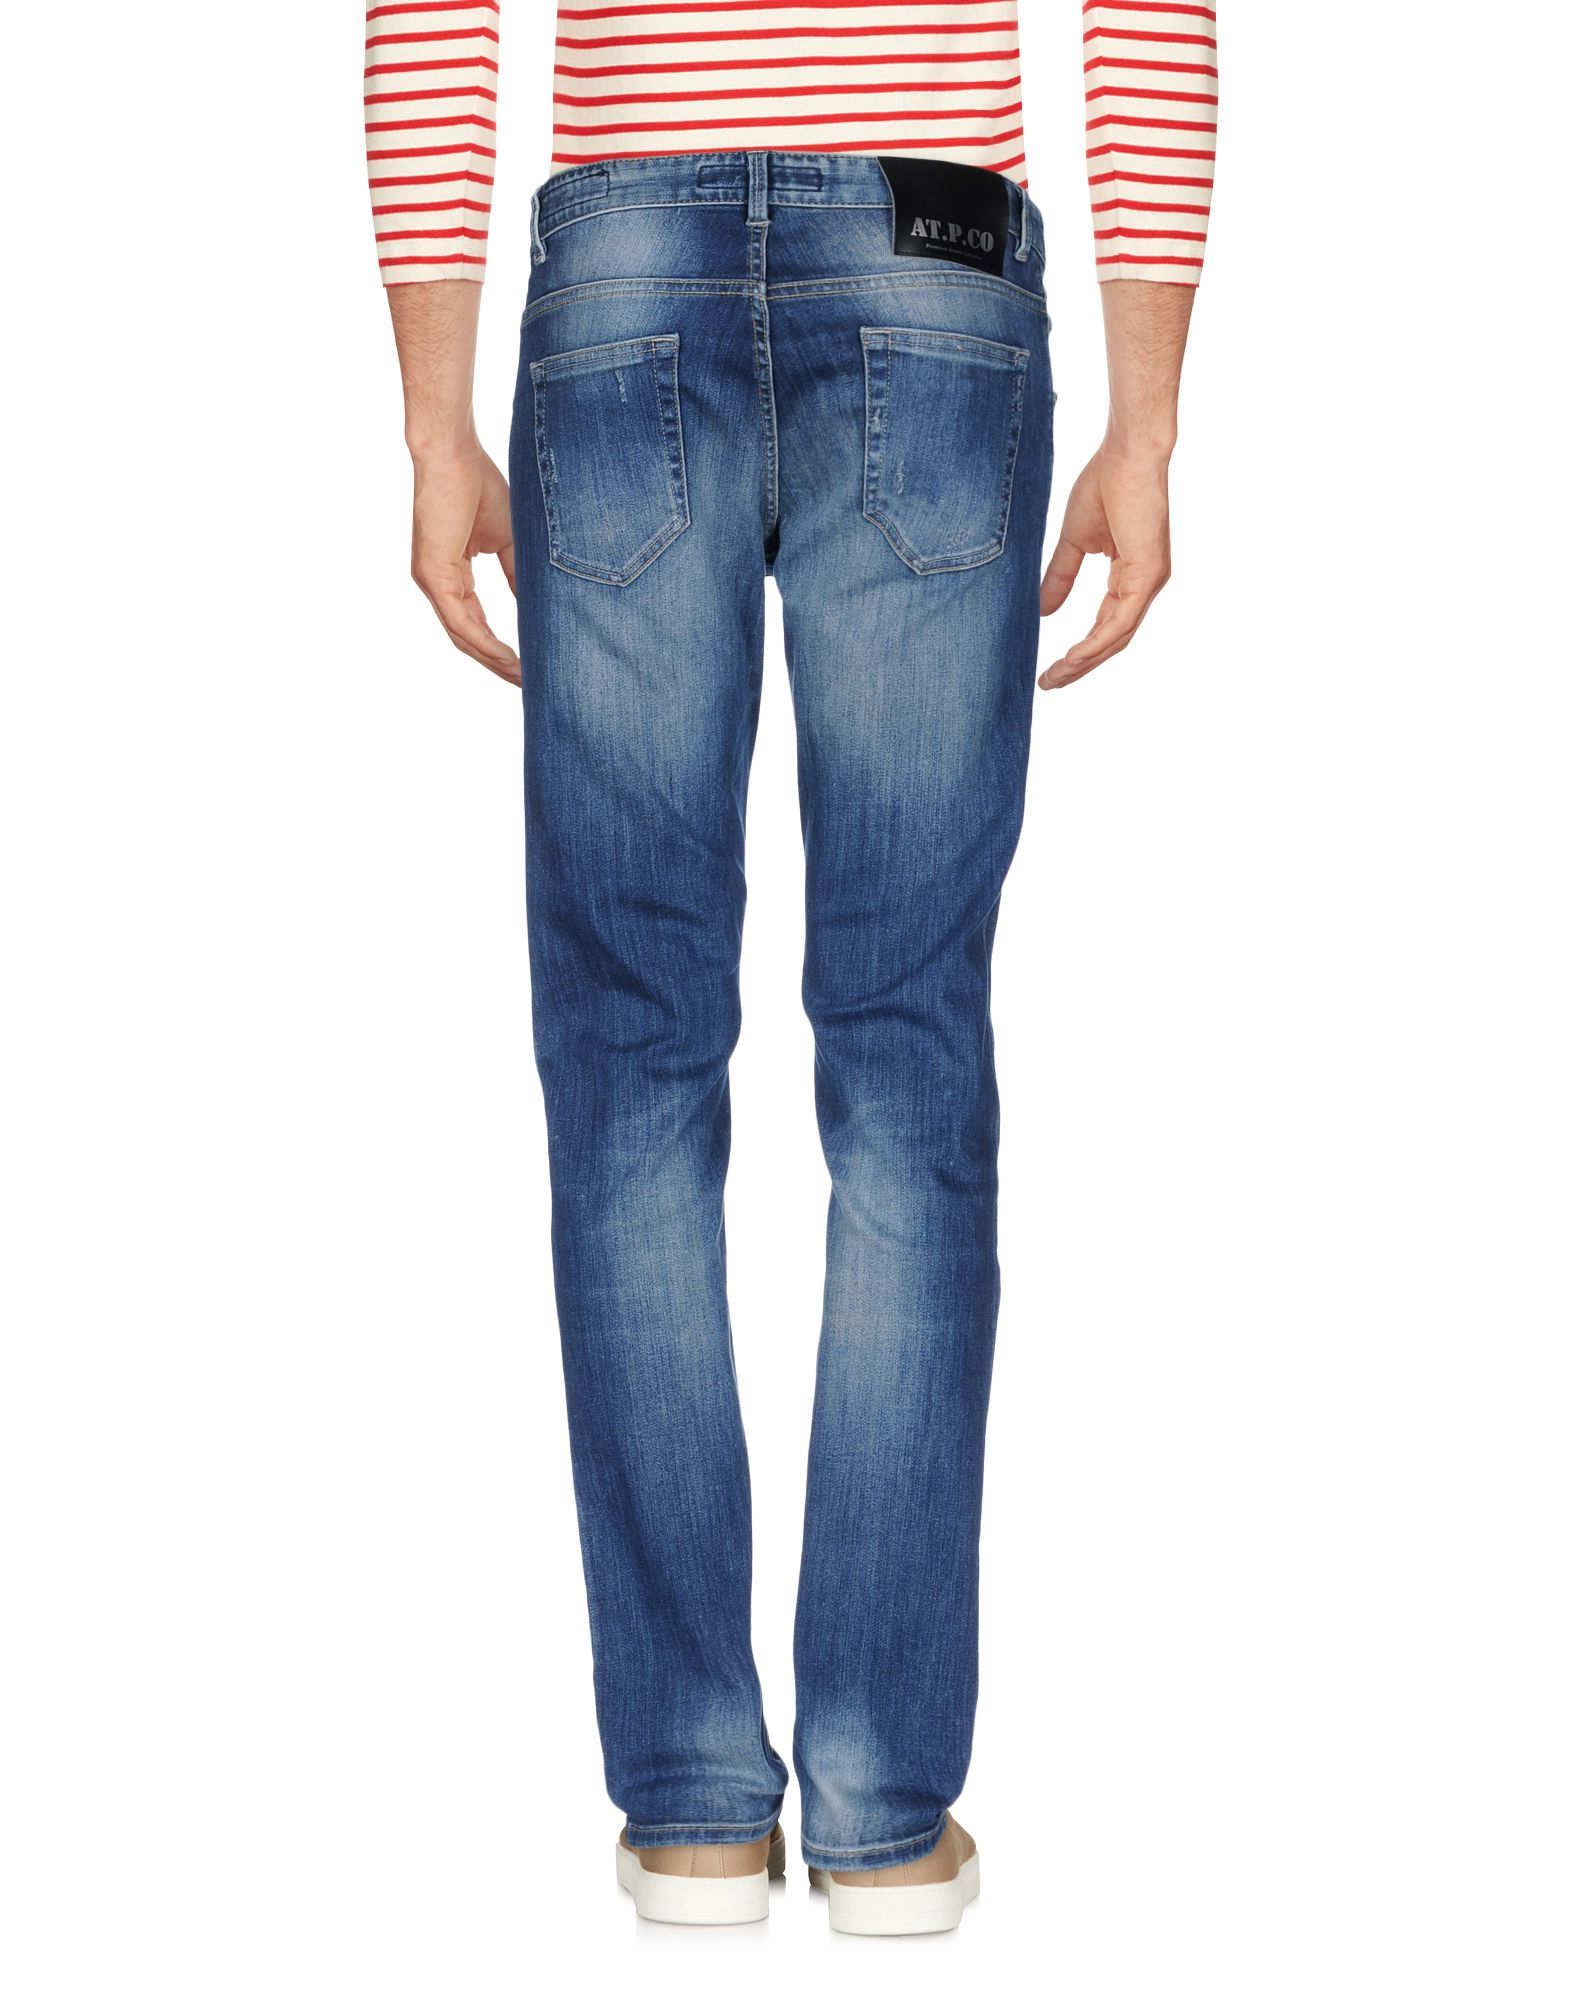 Pantaloni Jeans At.P.Co At.P.Co Jeans Uomo - 42625022PX b05b8c